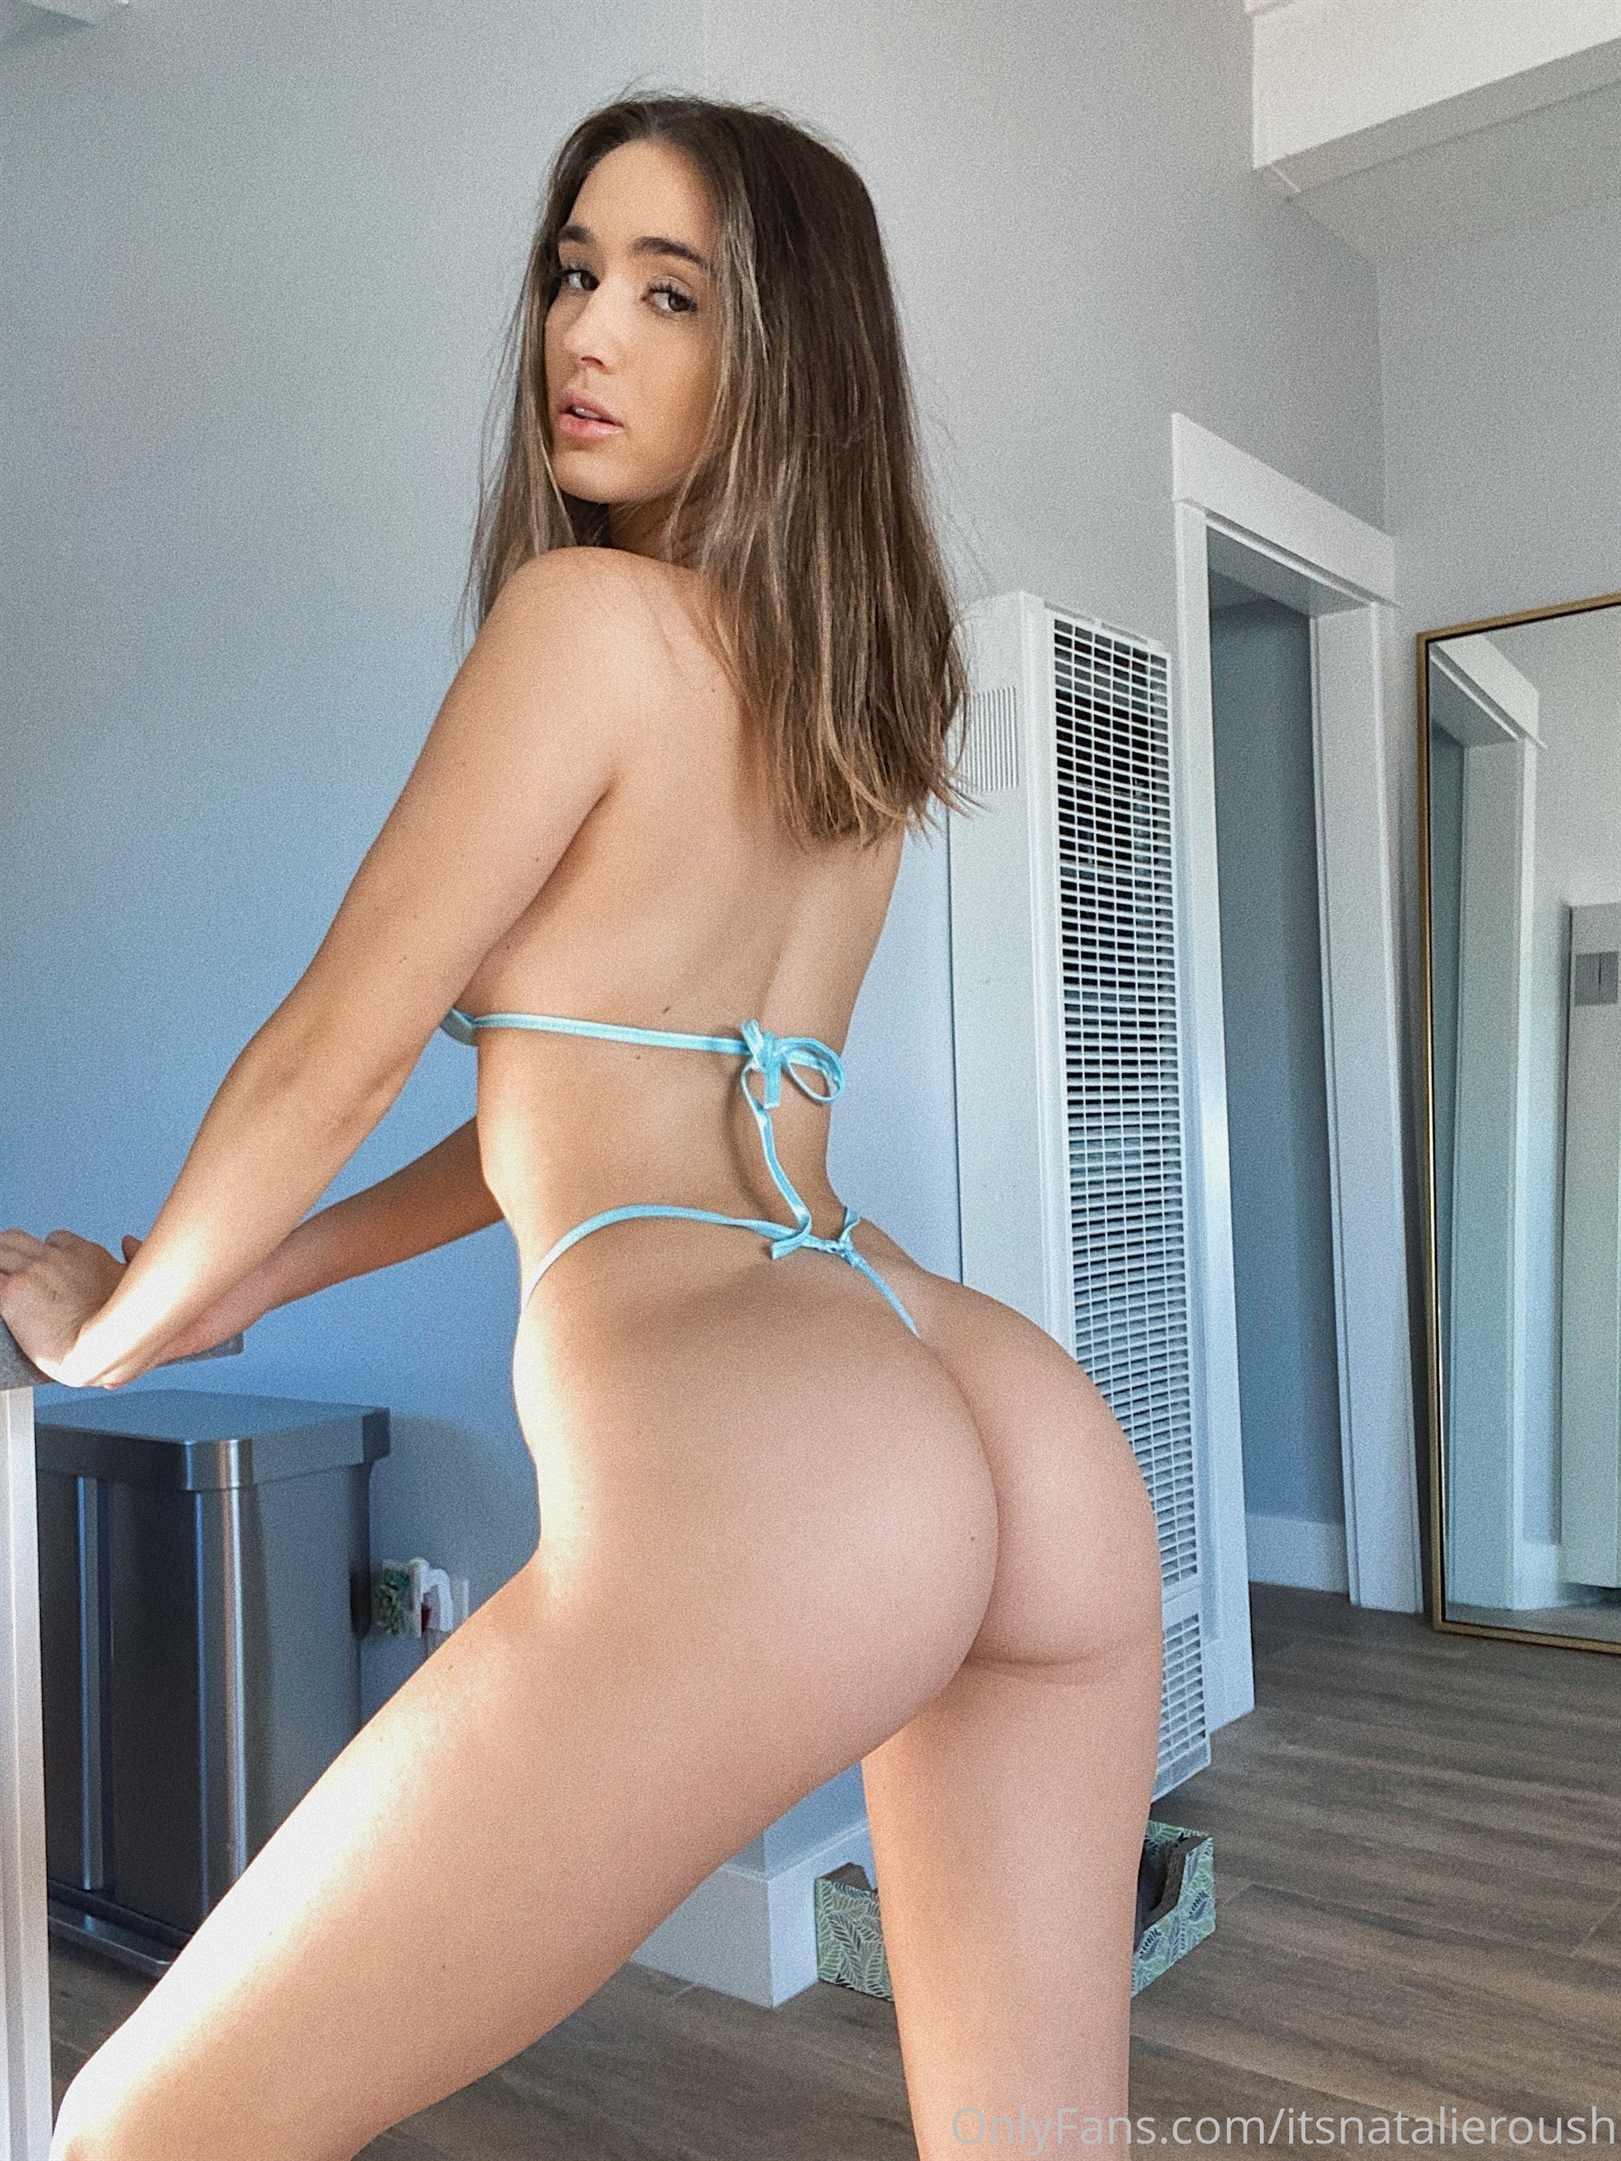 Natalie Roush Micro Bikini Try Nude Leaked 0008